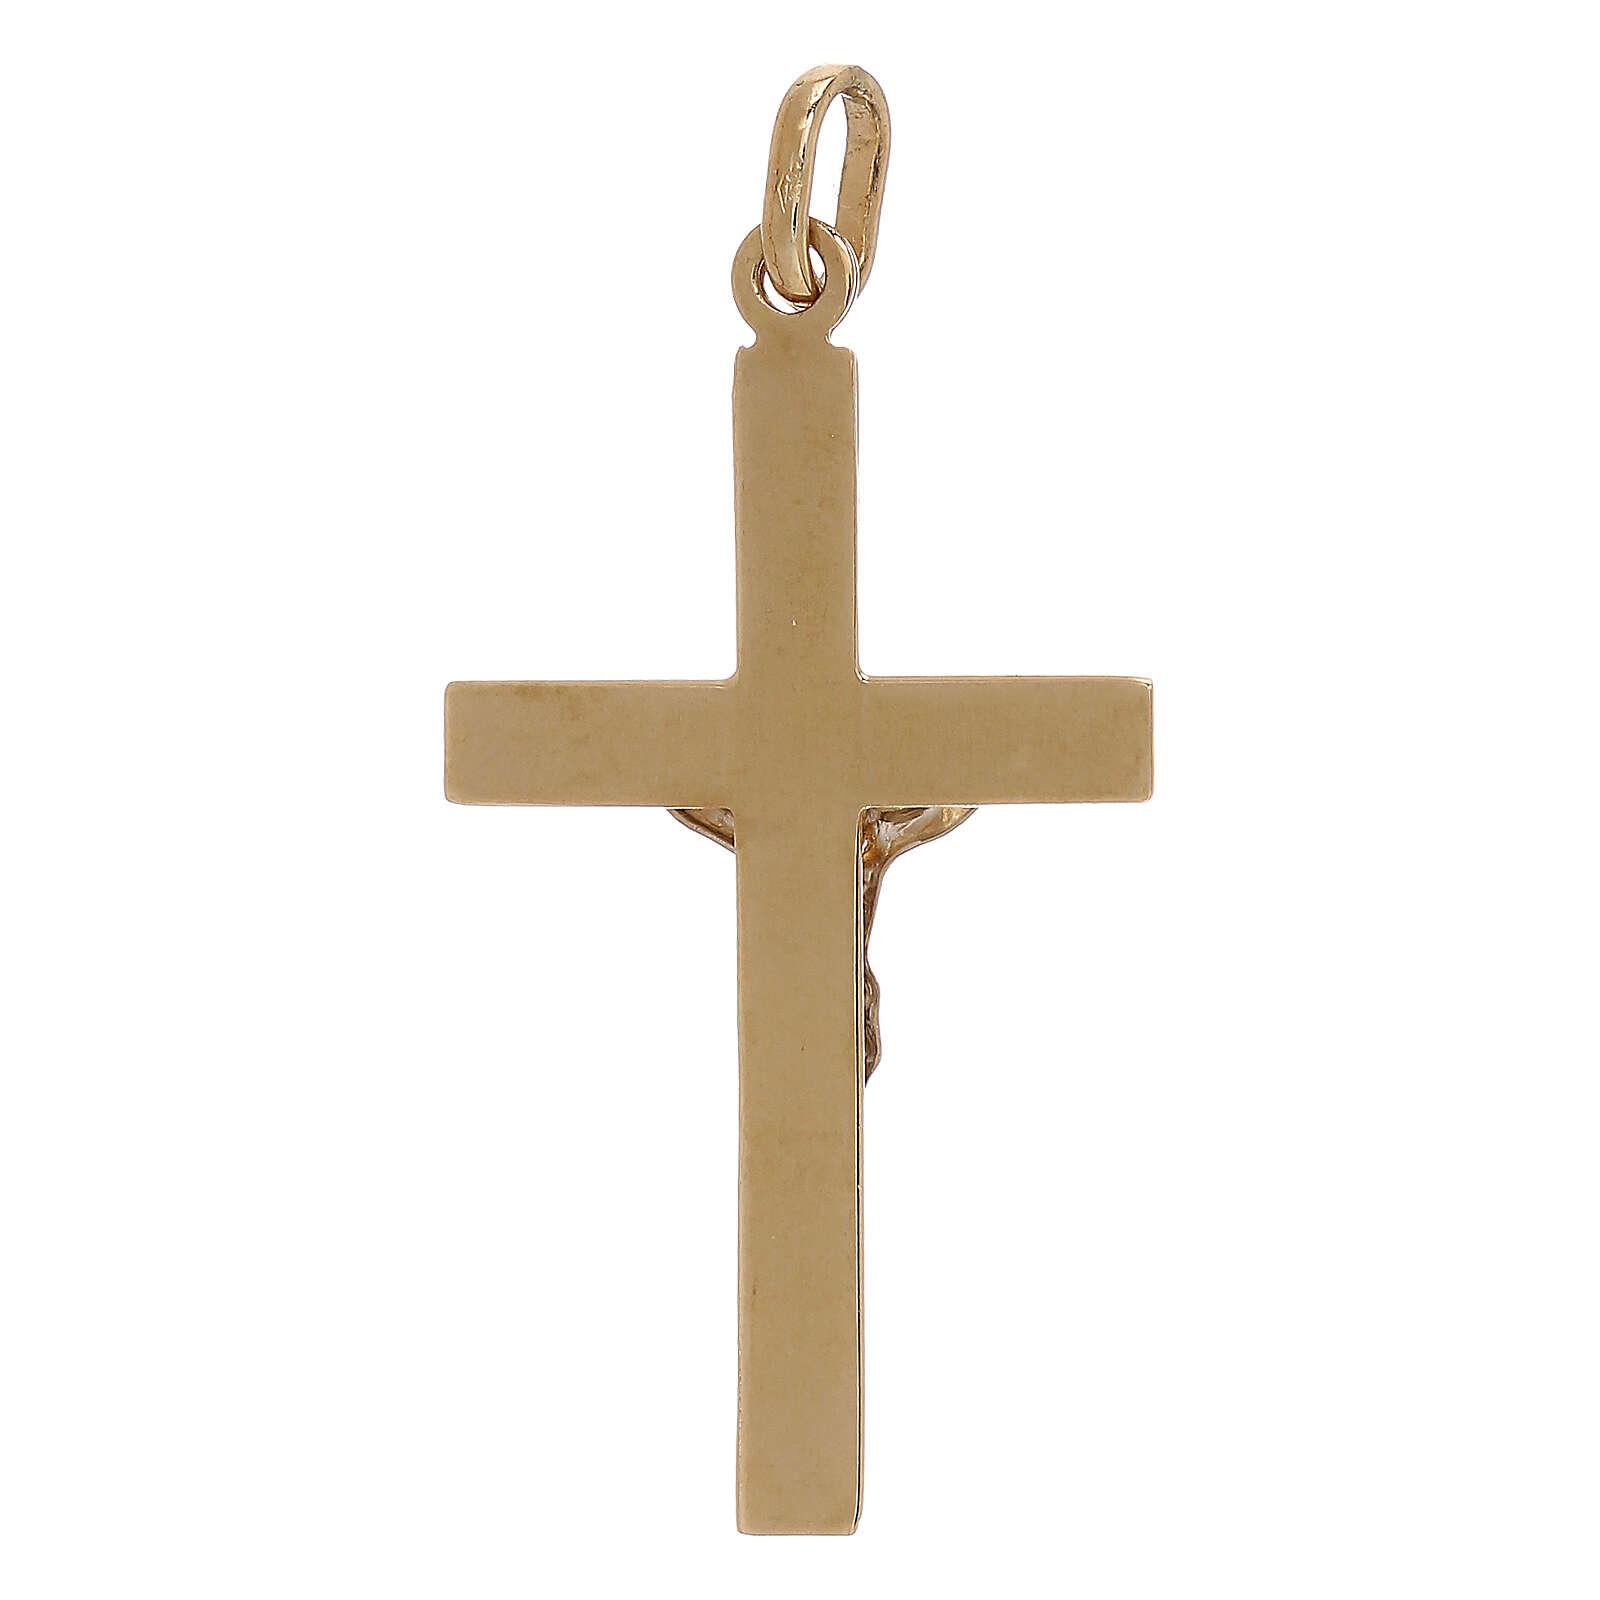 Croix pendentif bicolore relief or 18K 1,2 gr 4